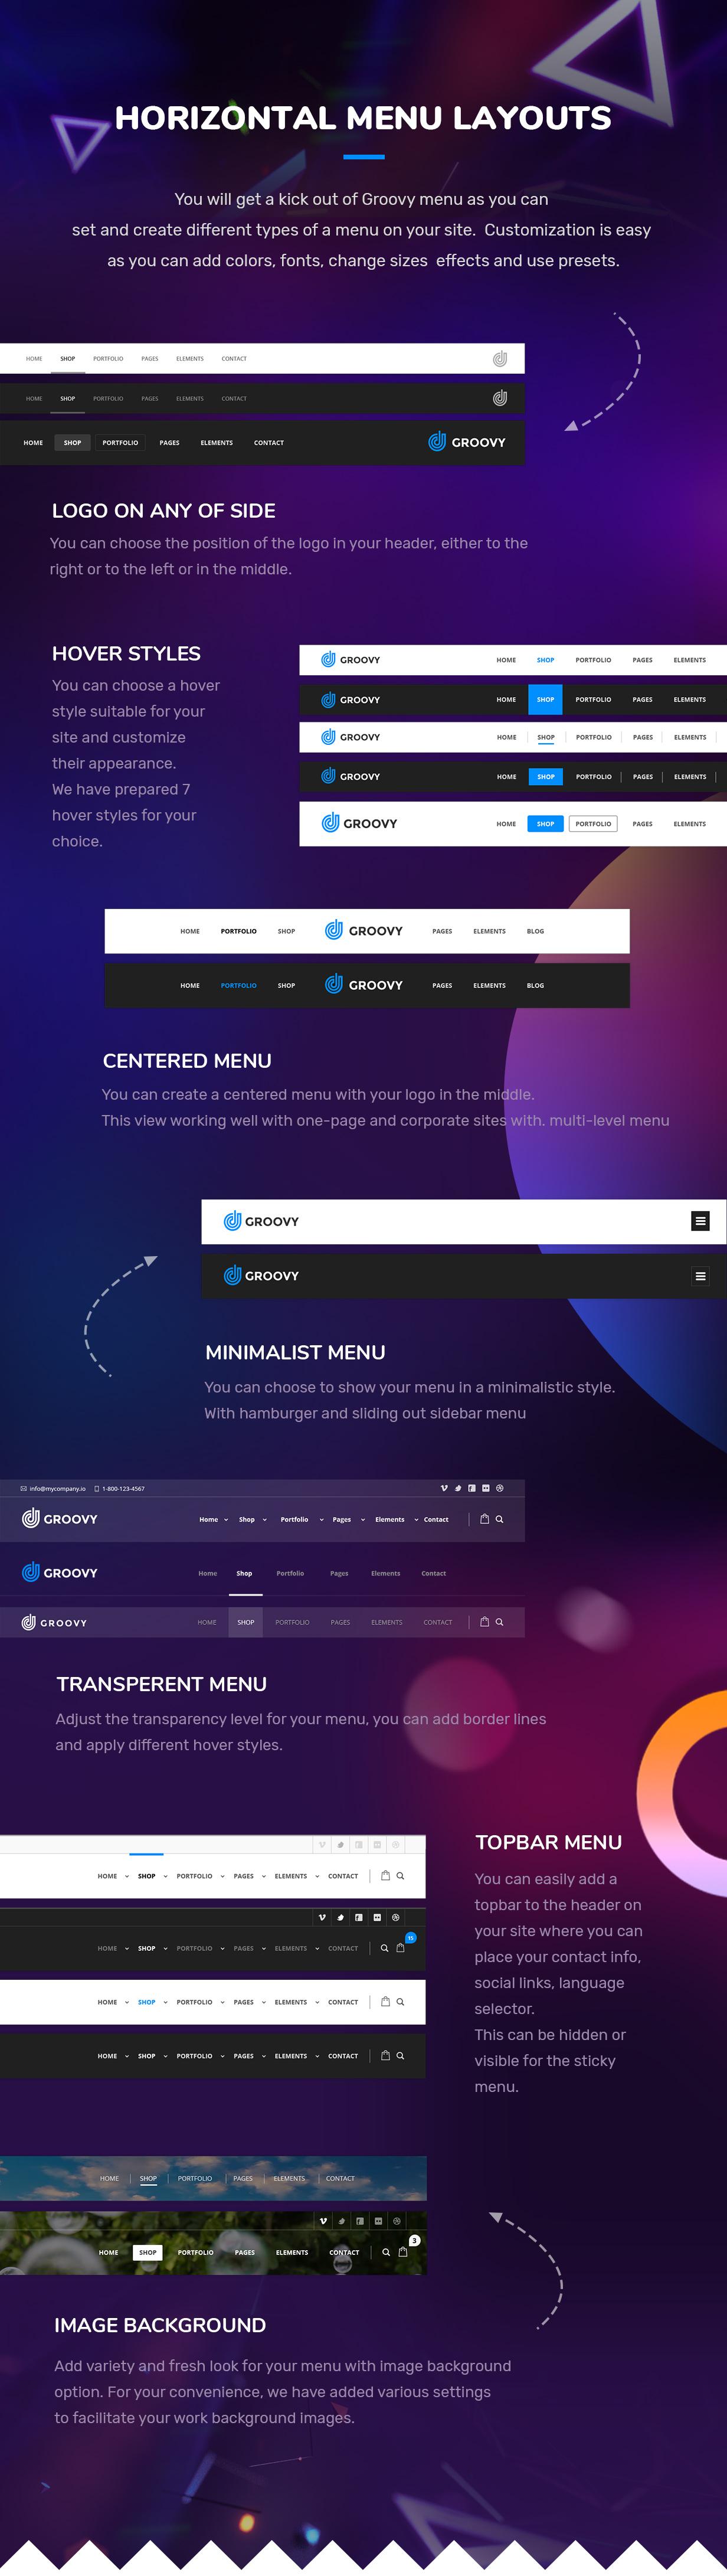 horizontal mega menu